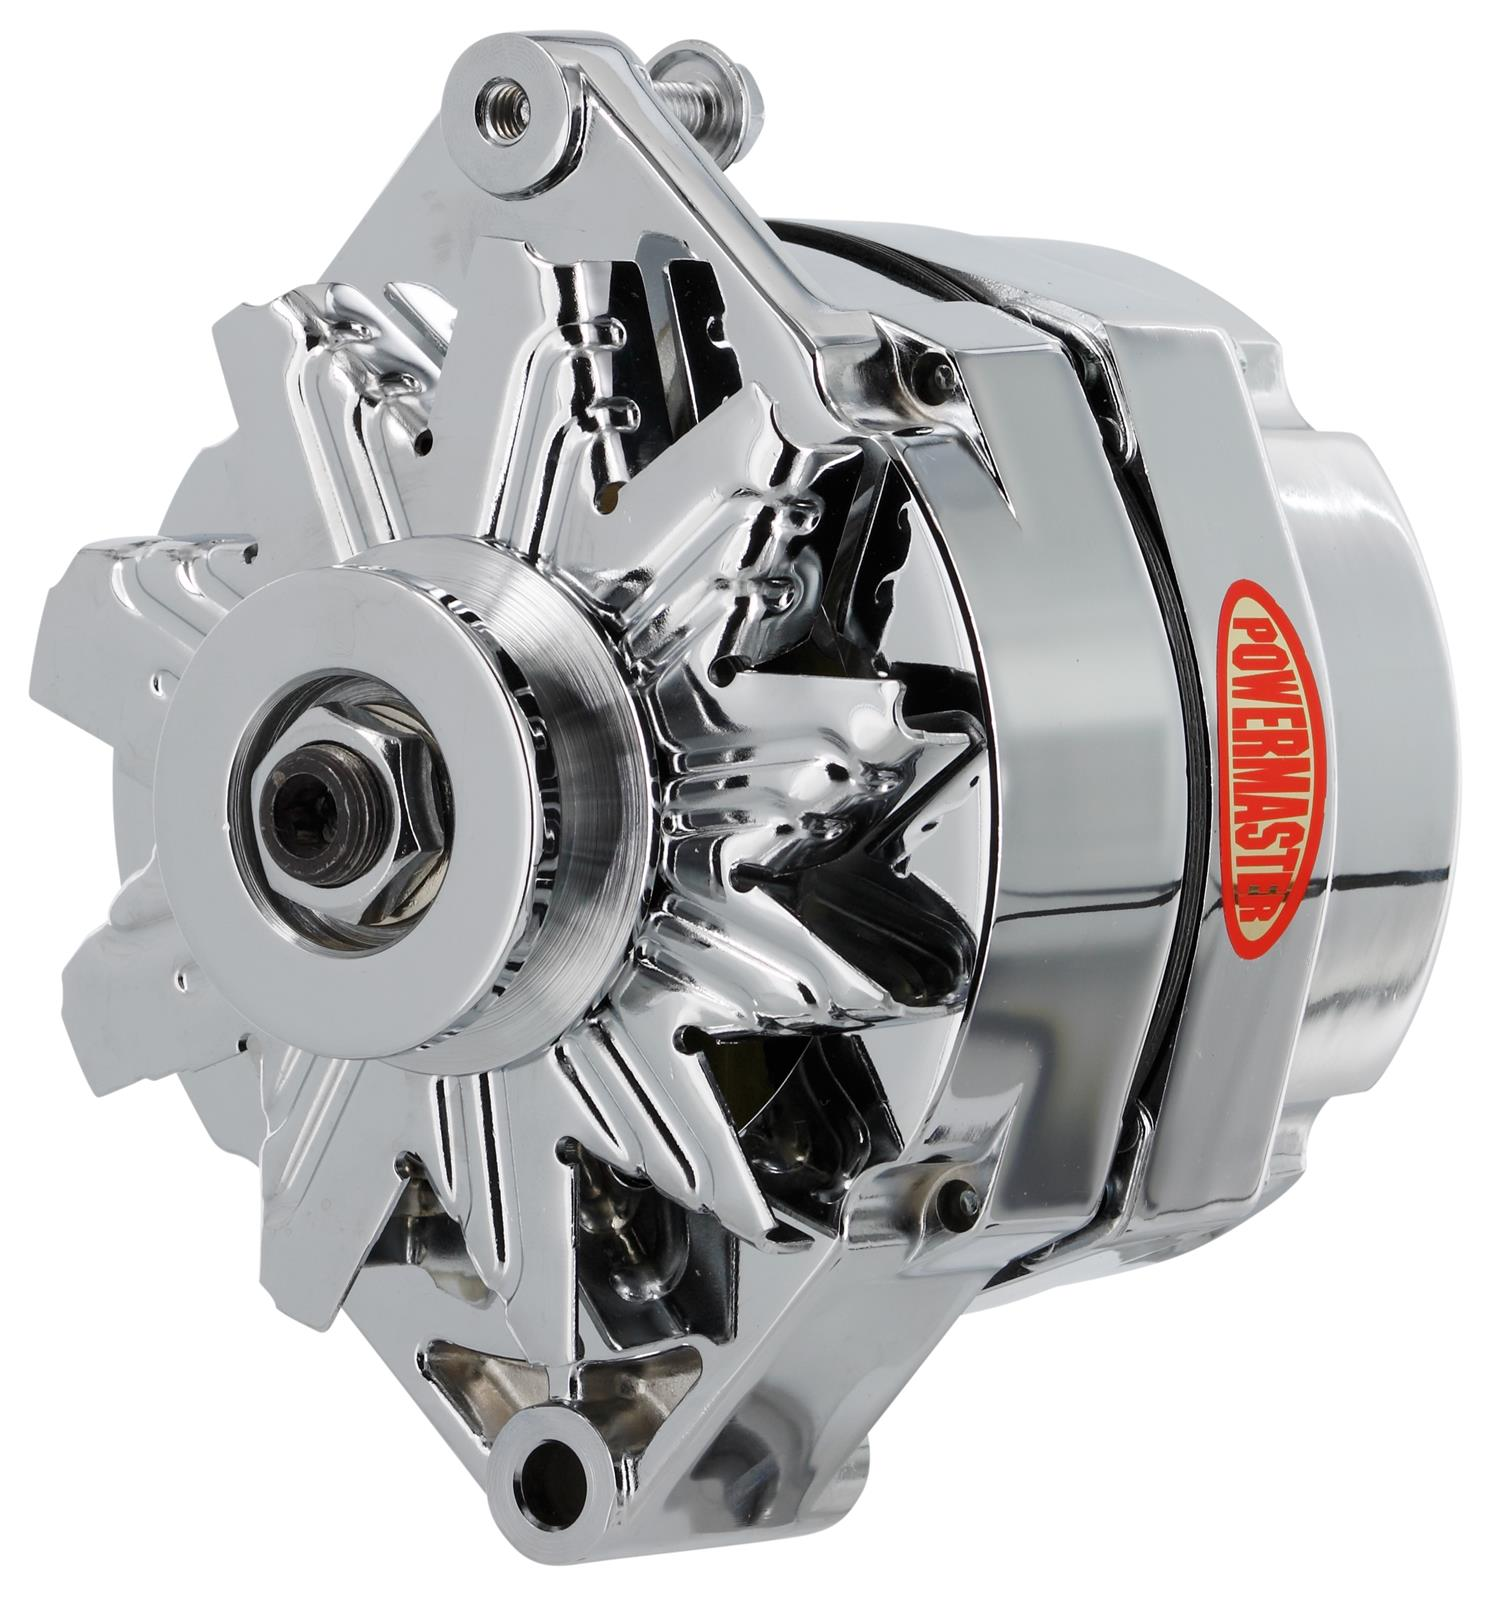 17127powermaster Alternator Gm 10si Chrome Bcm Wiring Diagram 2002 ...